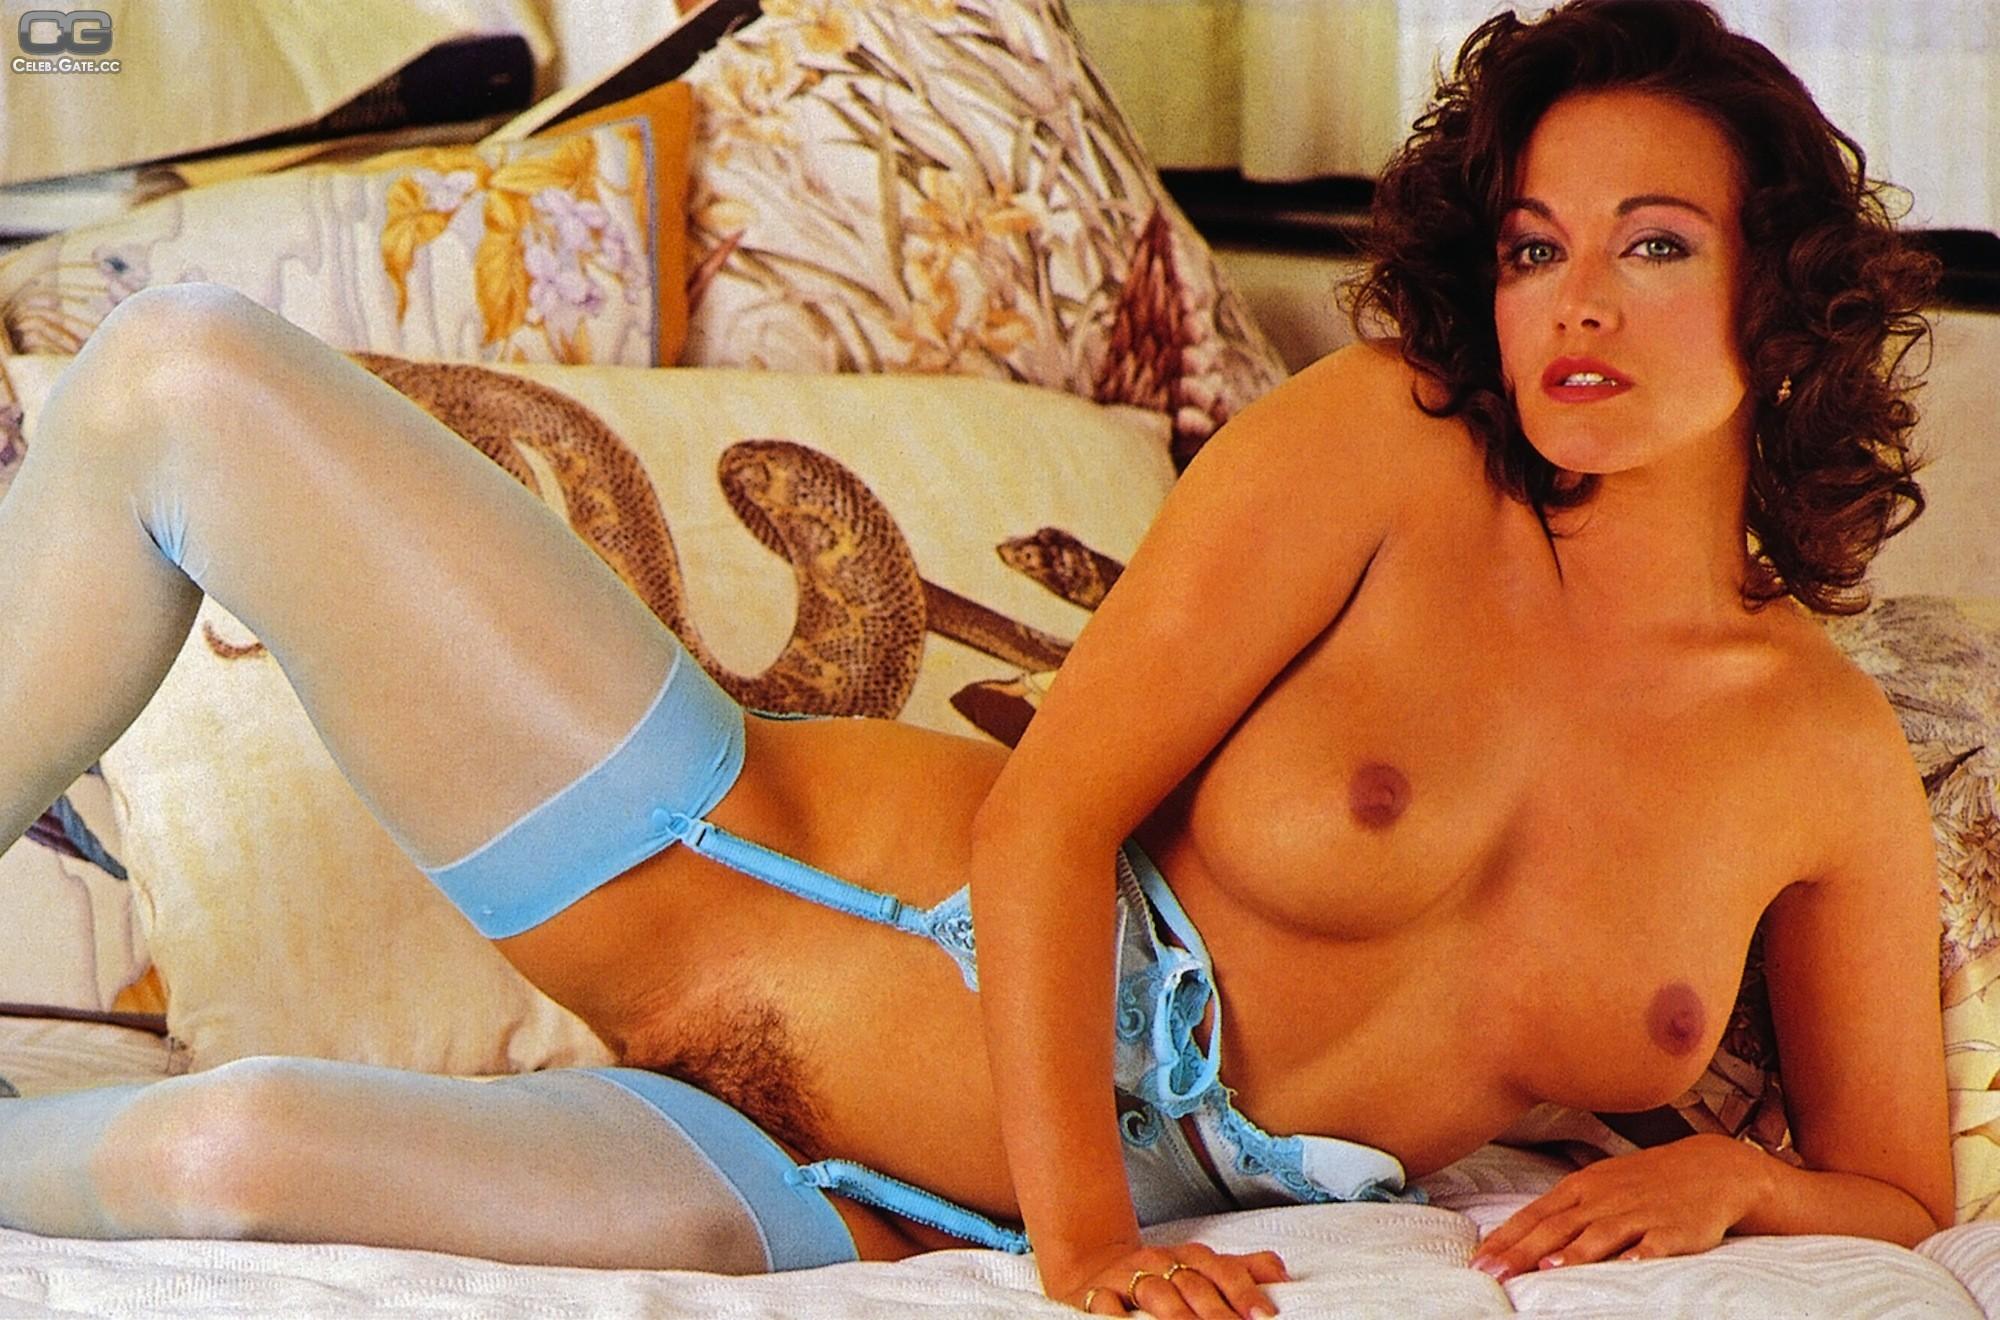 Hot lesbian sex with big tits